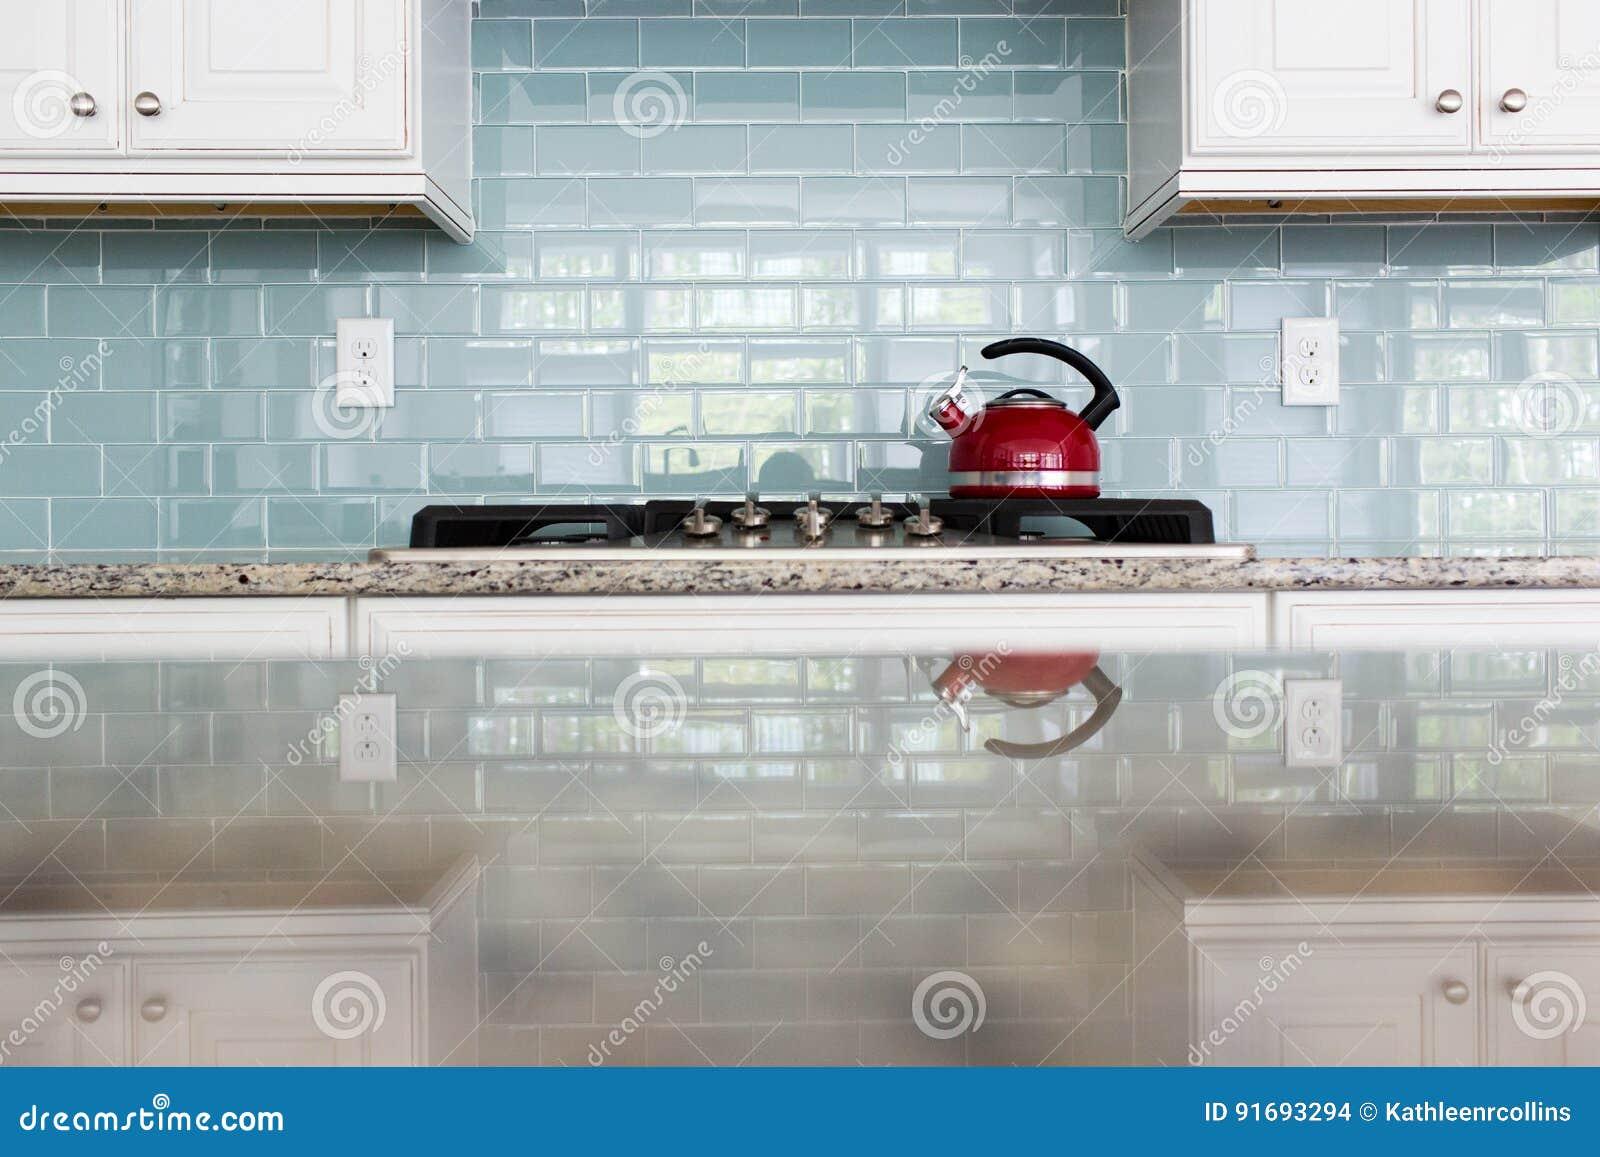 Red Kettle Glass Backsplash Subway Tile Kitchen Stock Photo ...